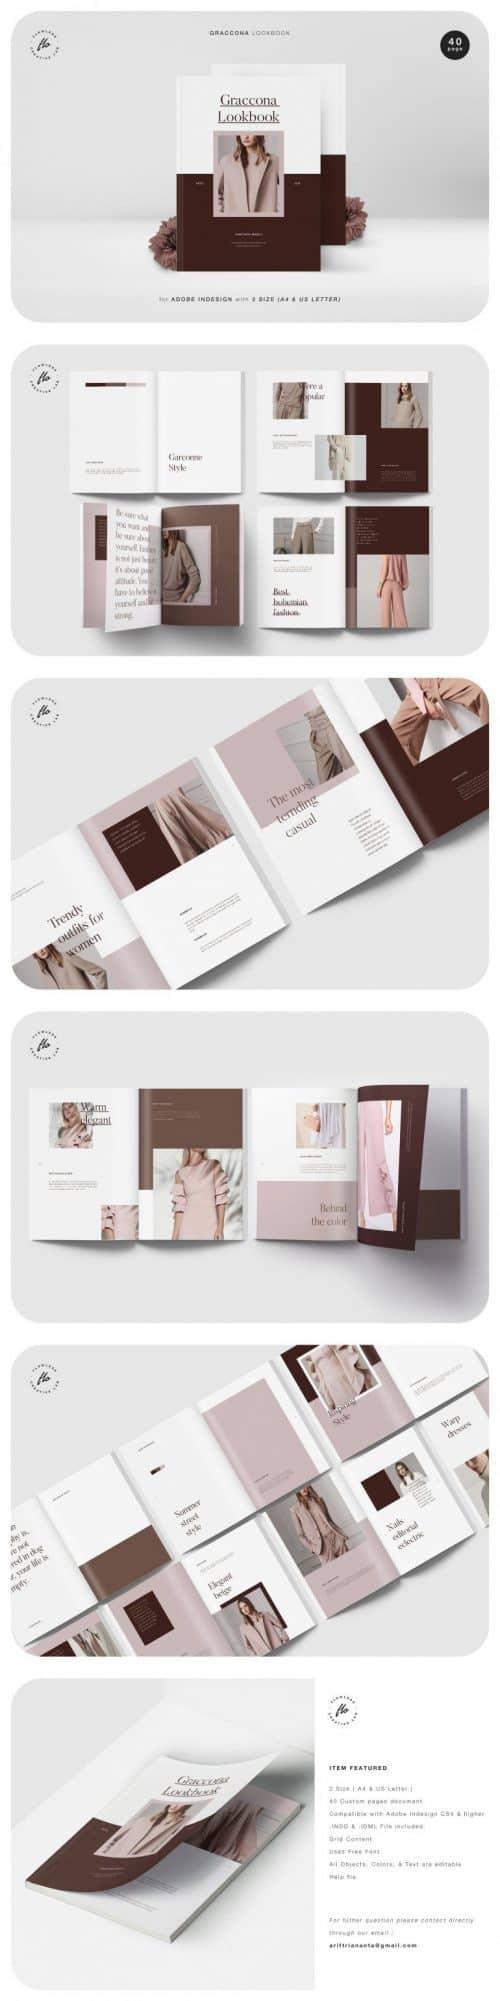 Graphic Design | Poster | GRACCONA Lookbook